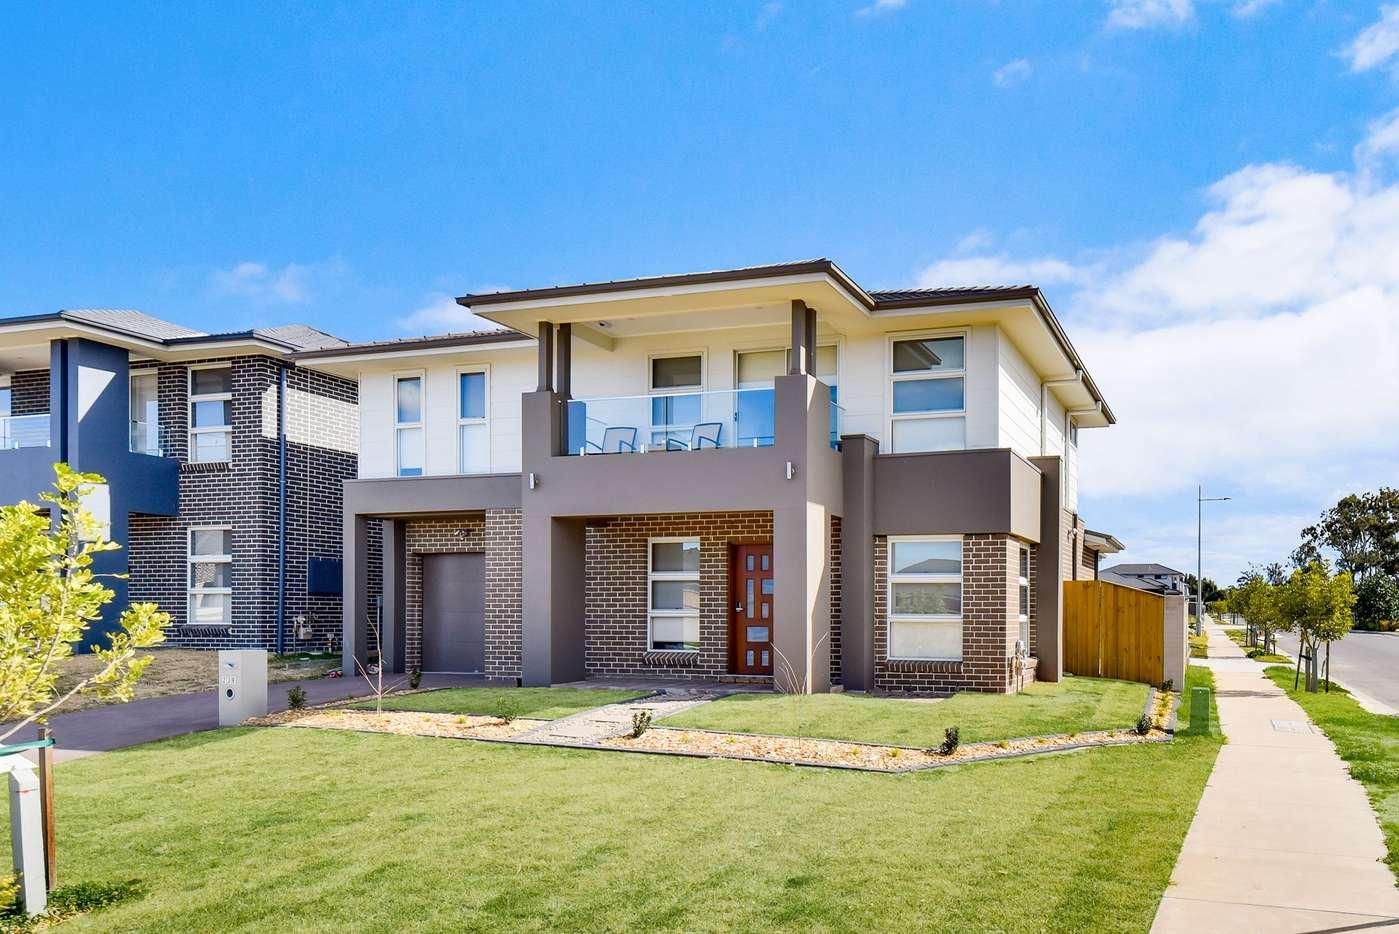 Main view of Homely house listing, 23B Rowan Street, Oran Park, NSW 2570